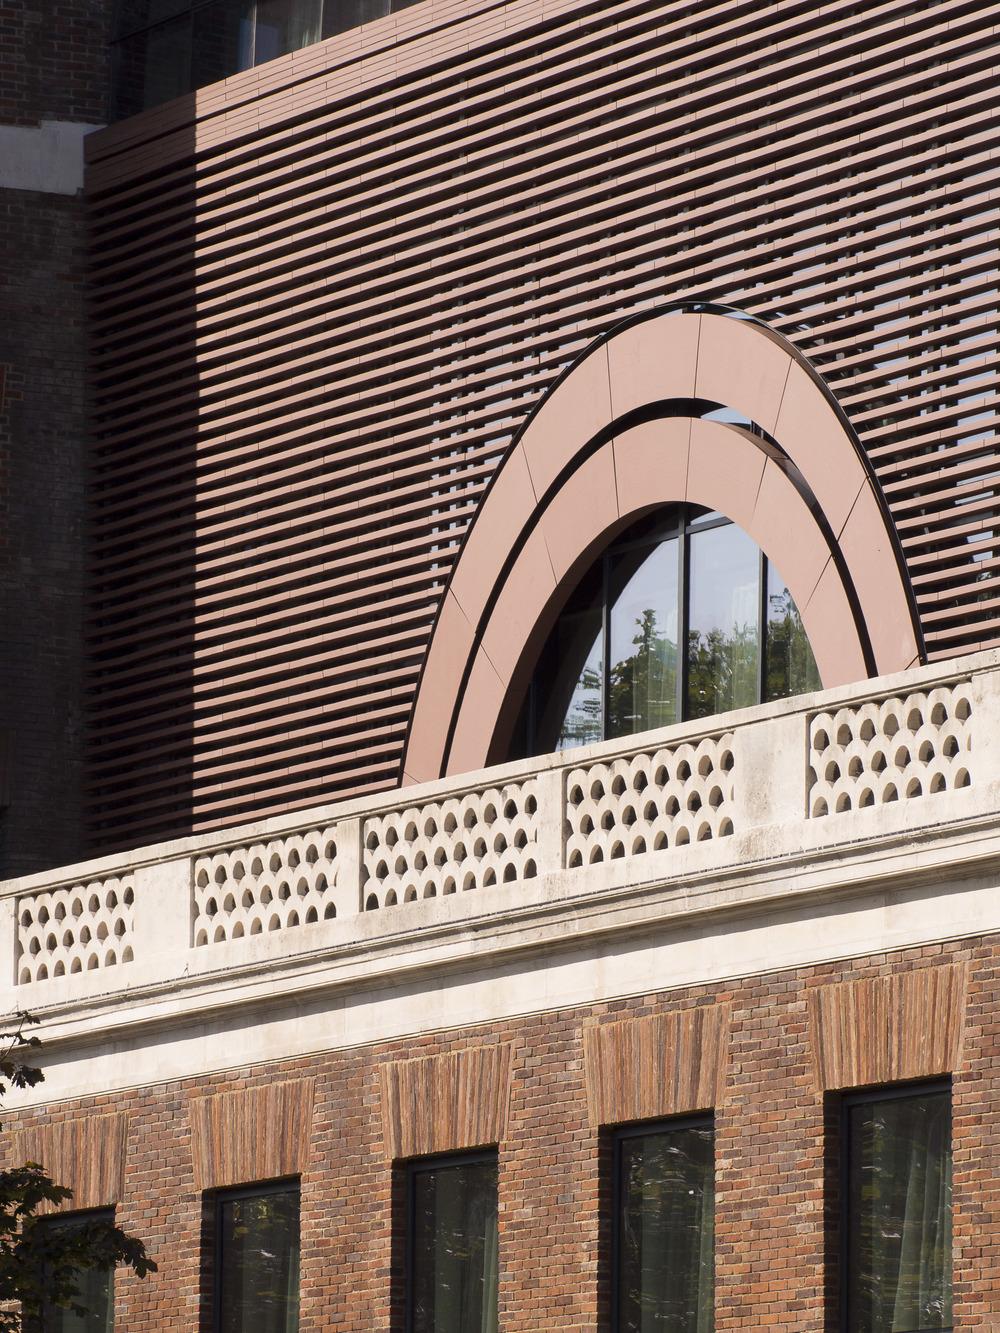 Dorsett Hotel facade detail (Nick Guttridge).jpg